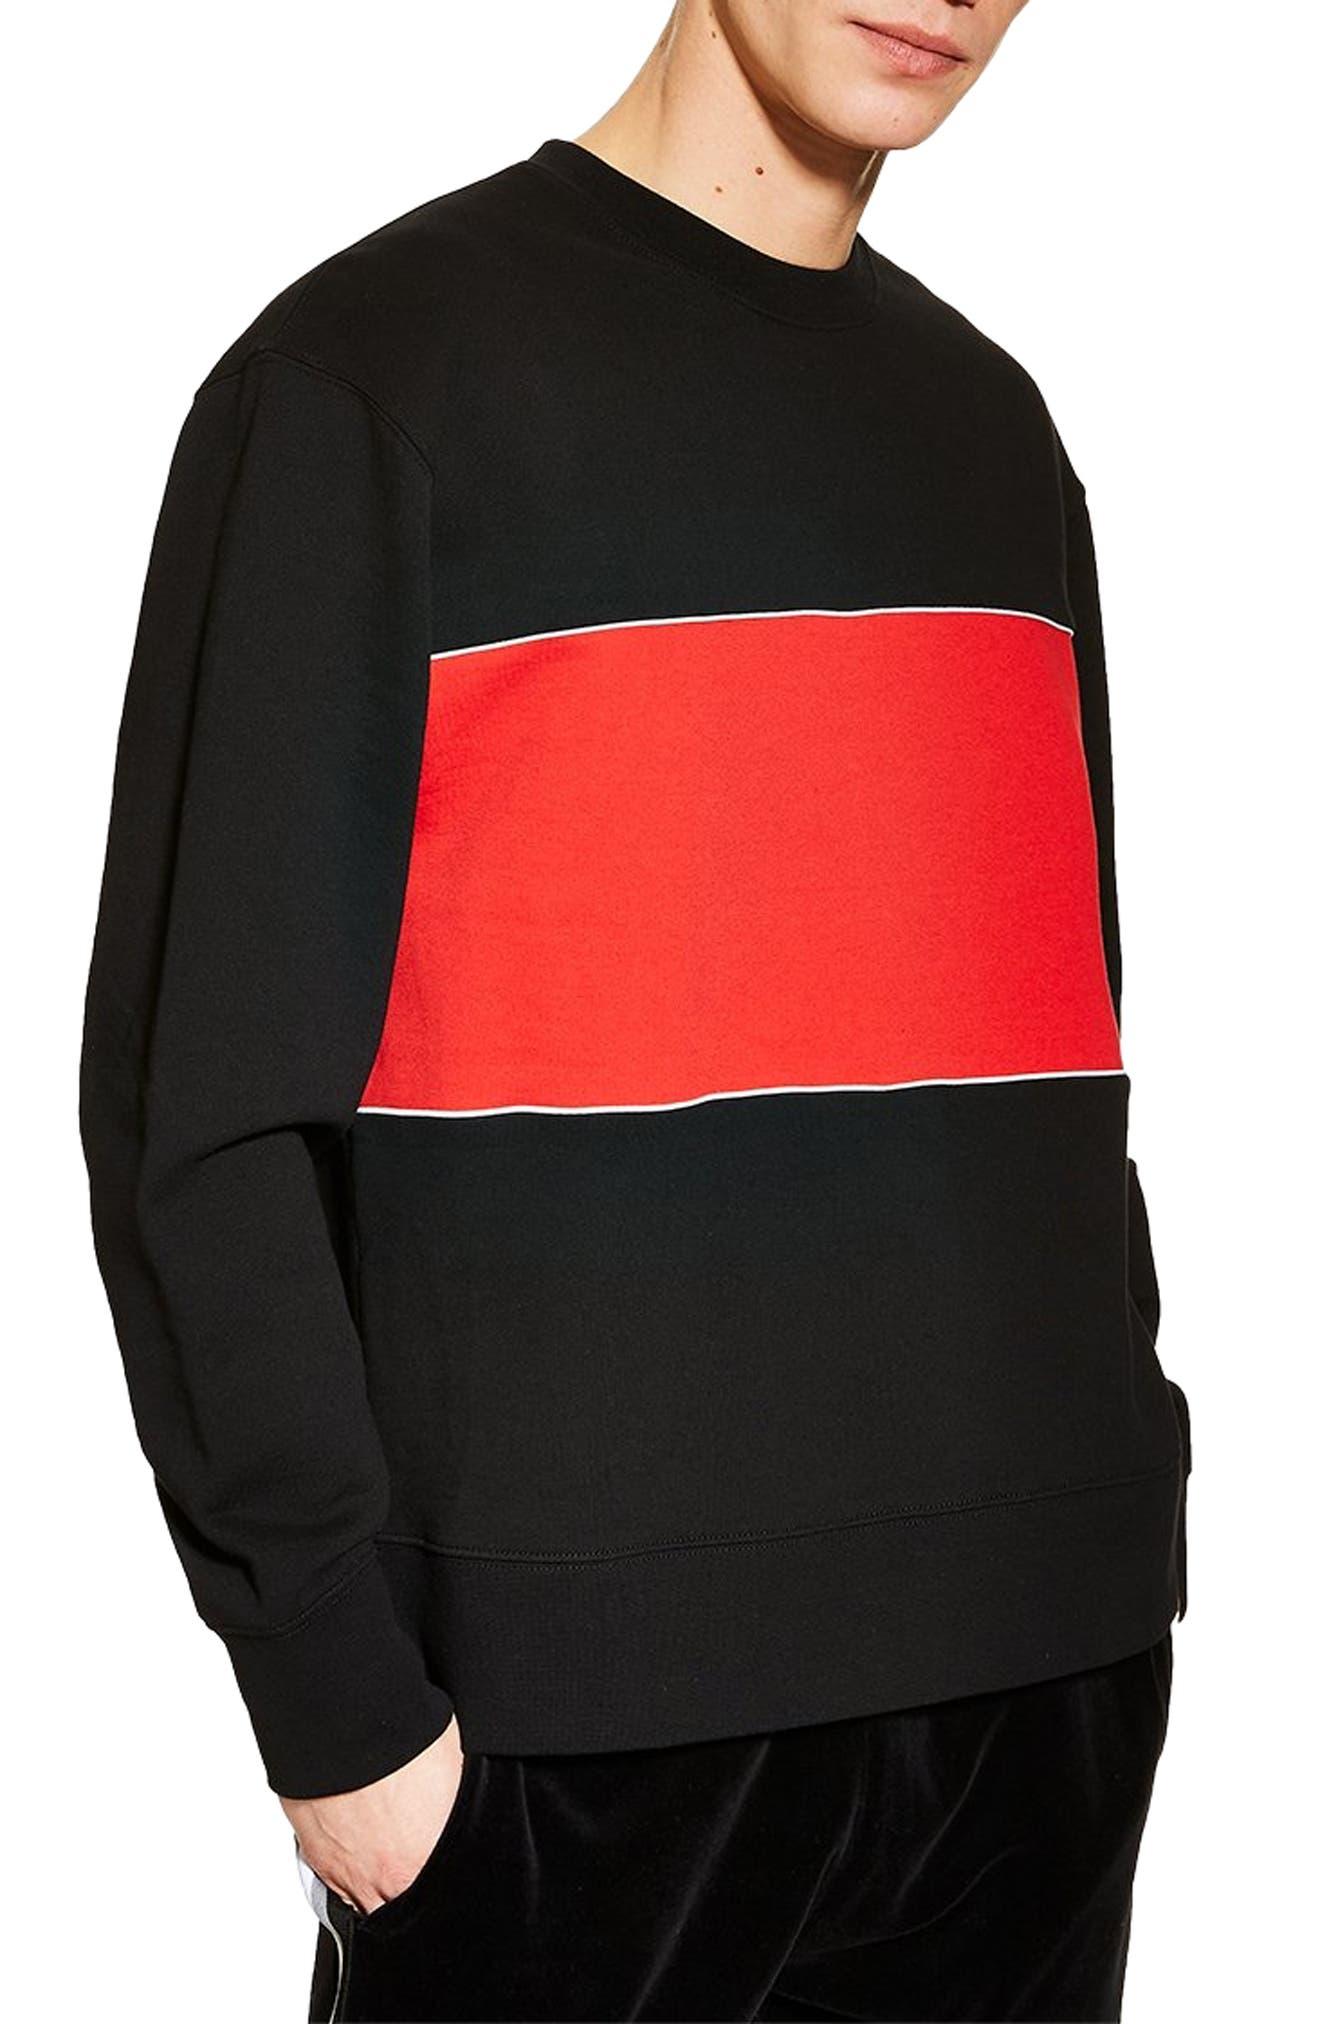 TOPMAN, Colorblock Longline Crewneck Sweatshirt, Main thumbnail 1, color, BLACK